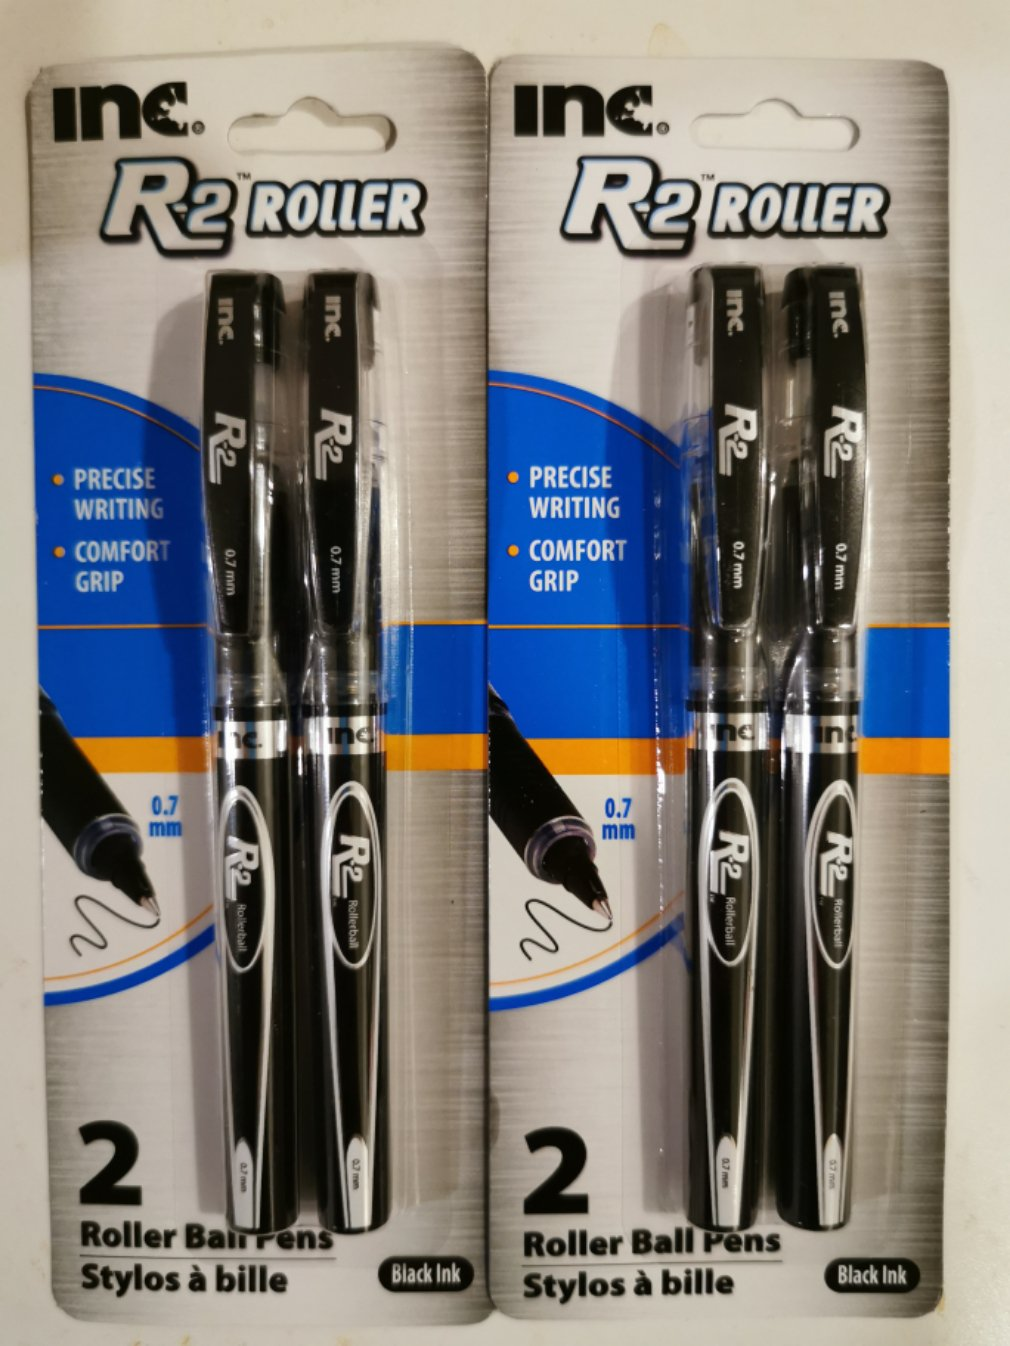 Inc. R2 Roller Rollerball 0.7mm Ink Pens - Black Ink (2 Pack)